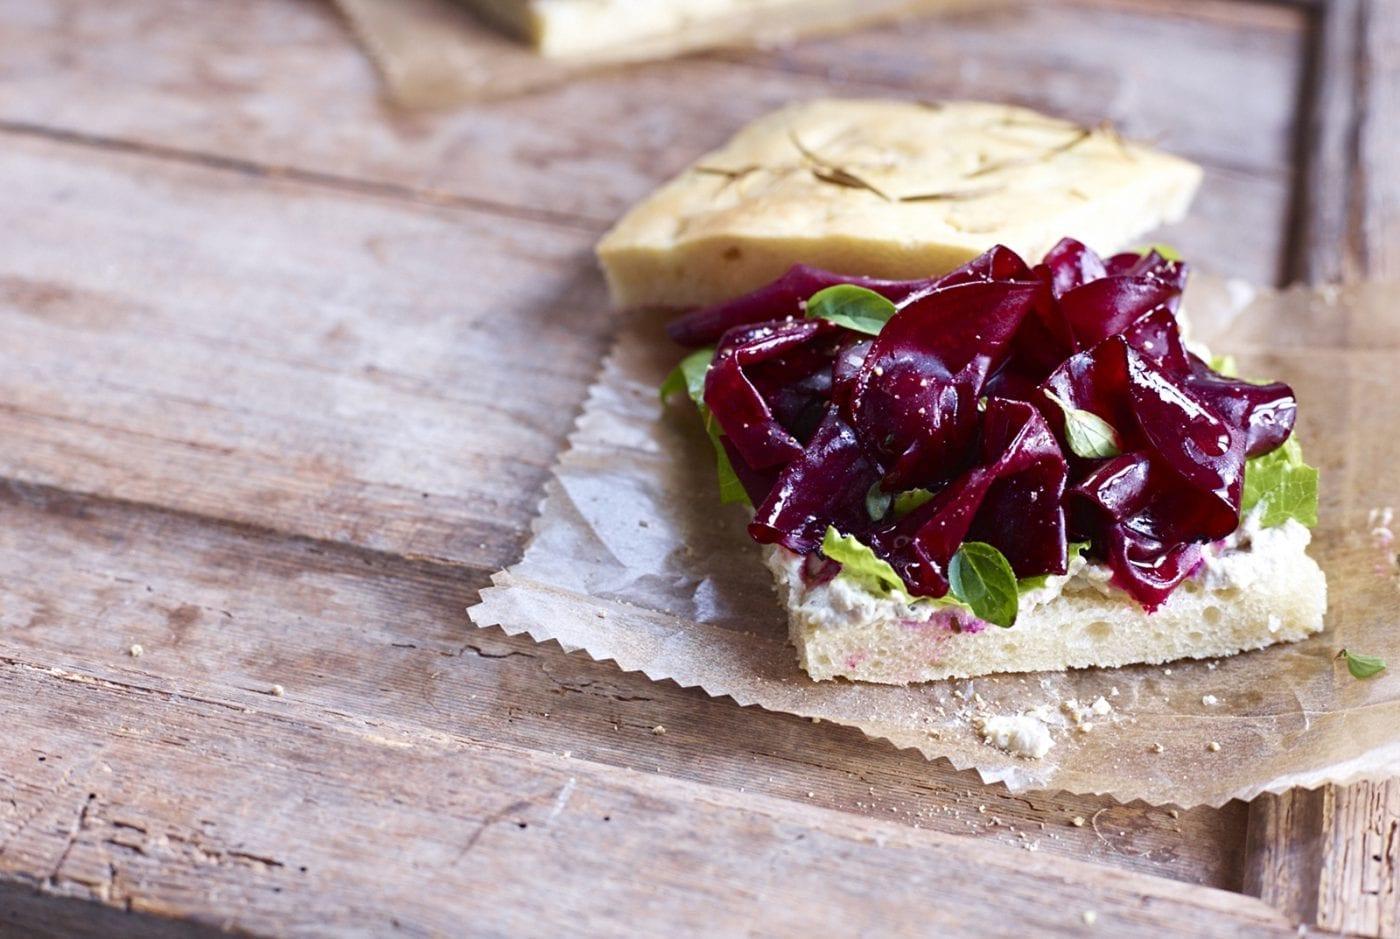 Surdhams Goeb Meine Vegane Kueche Rote Beete Sandwich